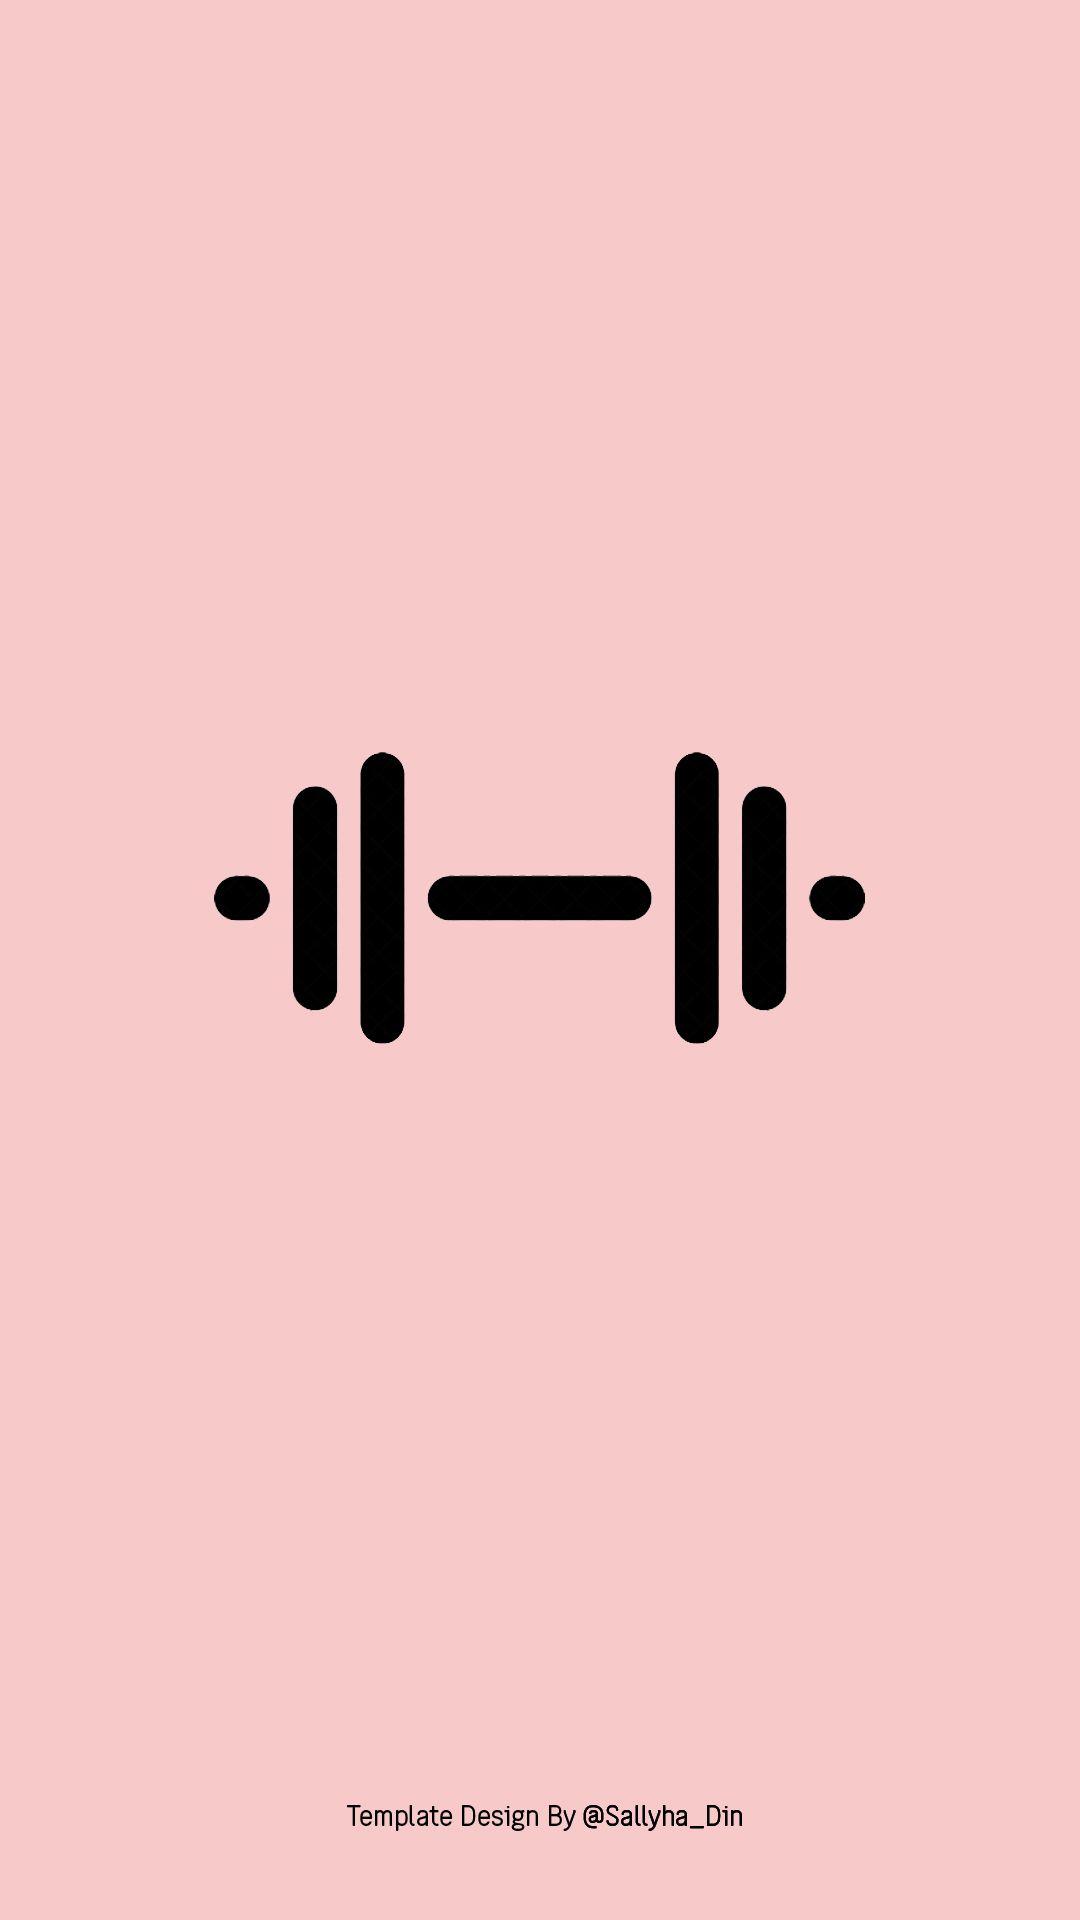 F I T N E S S Baby Pink Instagram Highlight Covers By Sallyha Din Www Instagram Com Sallyha Din Www Sallyhadin C Pink Instagram Instagram Icons Instagram Logo